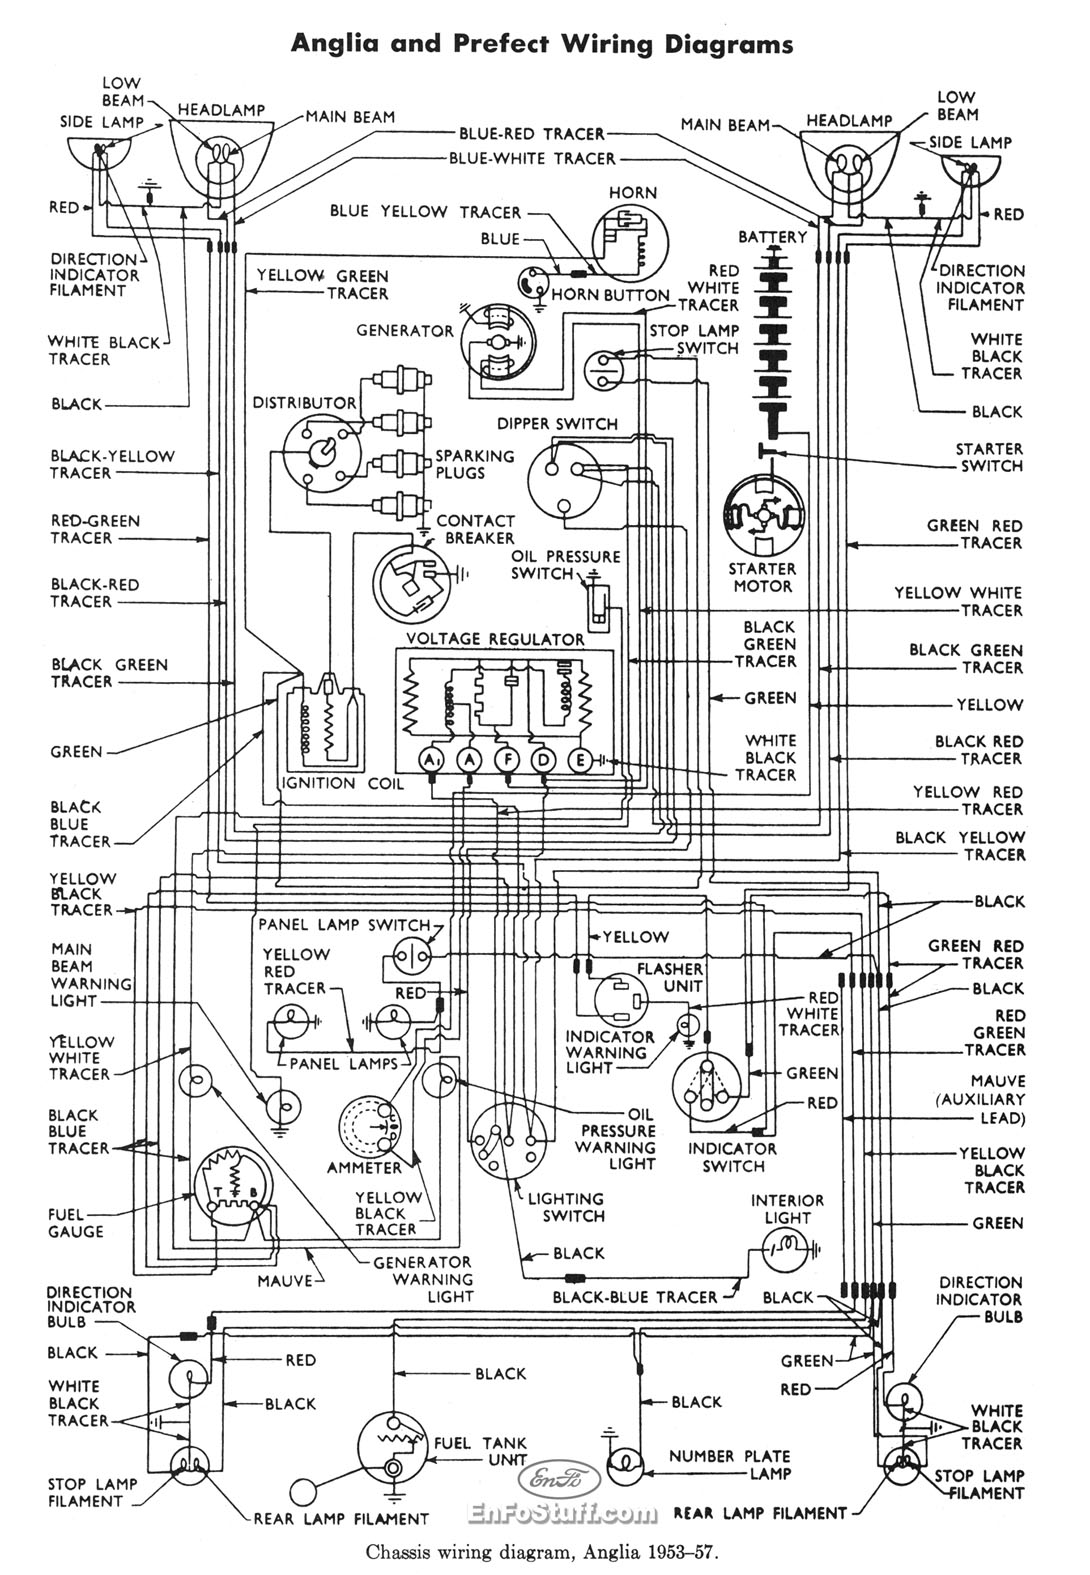 6610 ford tractor wiring diagram wiring diagrams mesmerizing ford 6610 alternator wiring car wiring harness color code ford 3600 tractor wiring diagram case asfbconference2016 Gallery